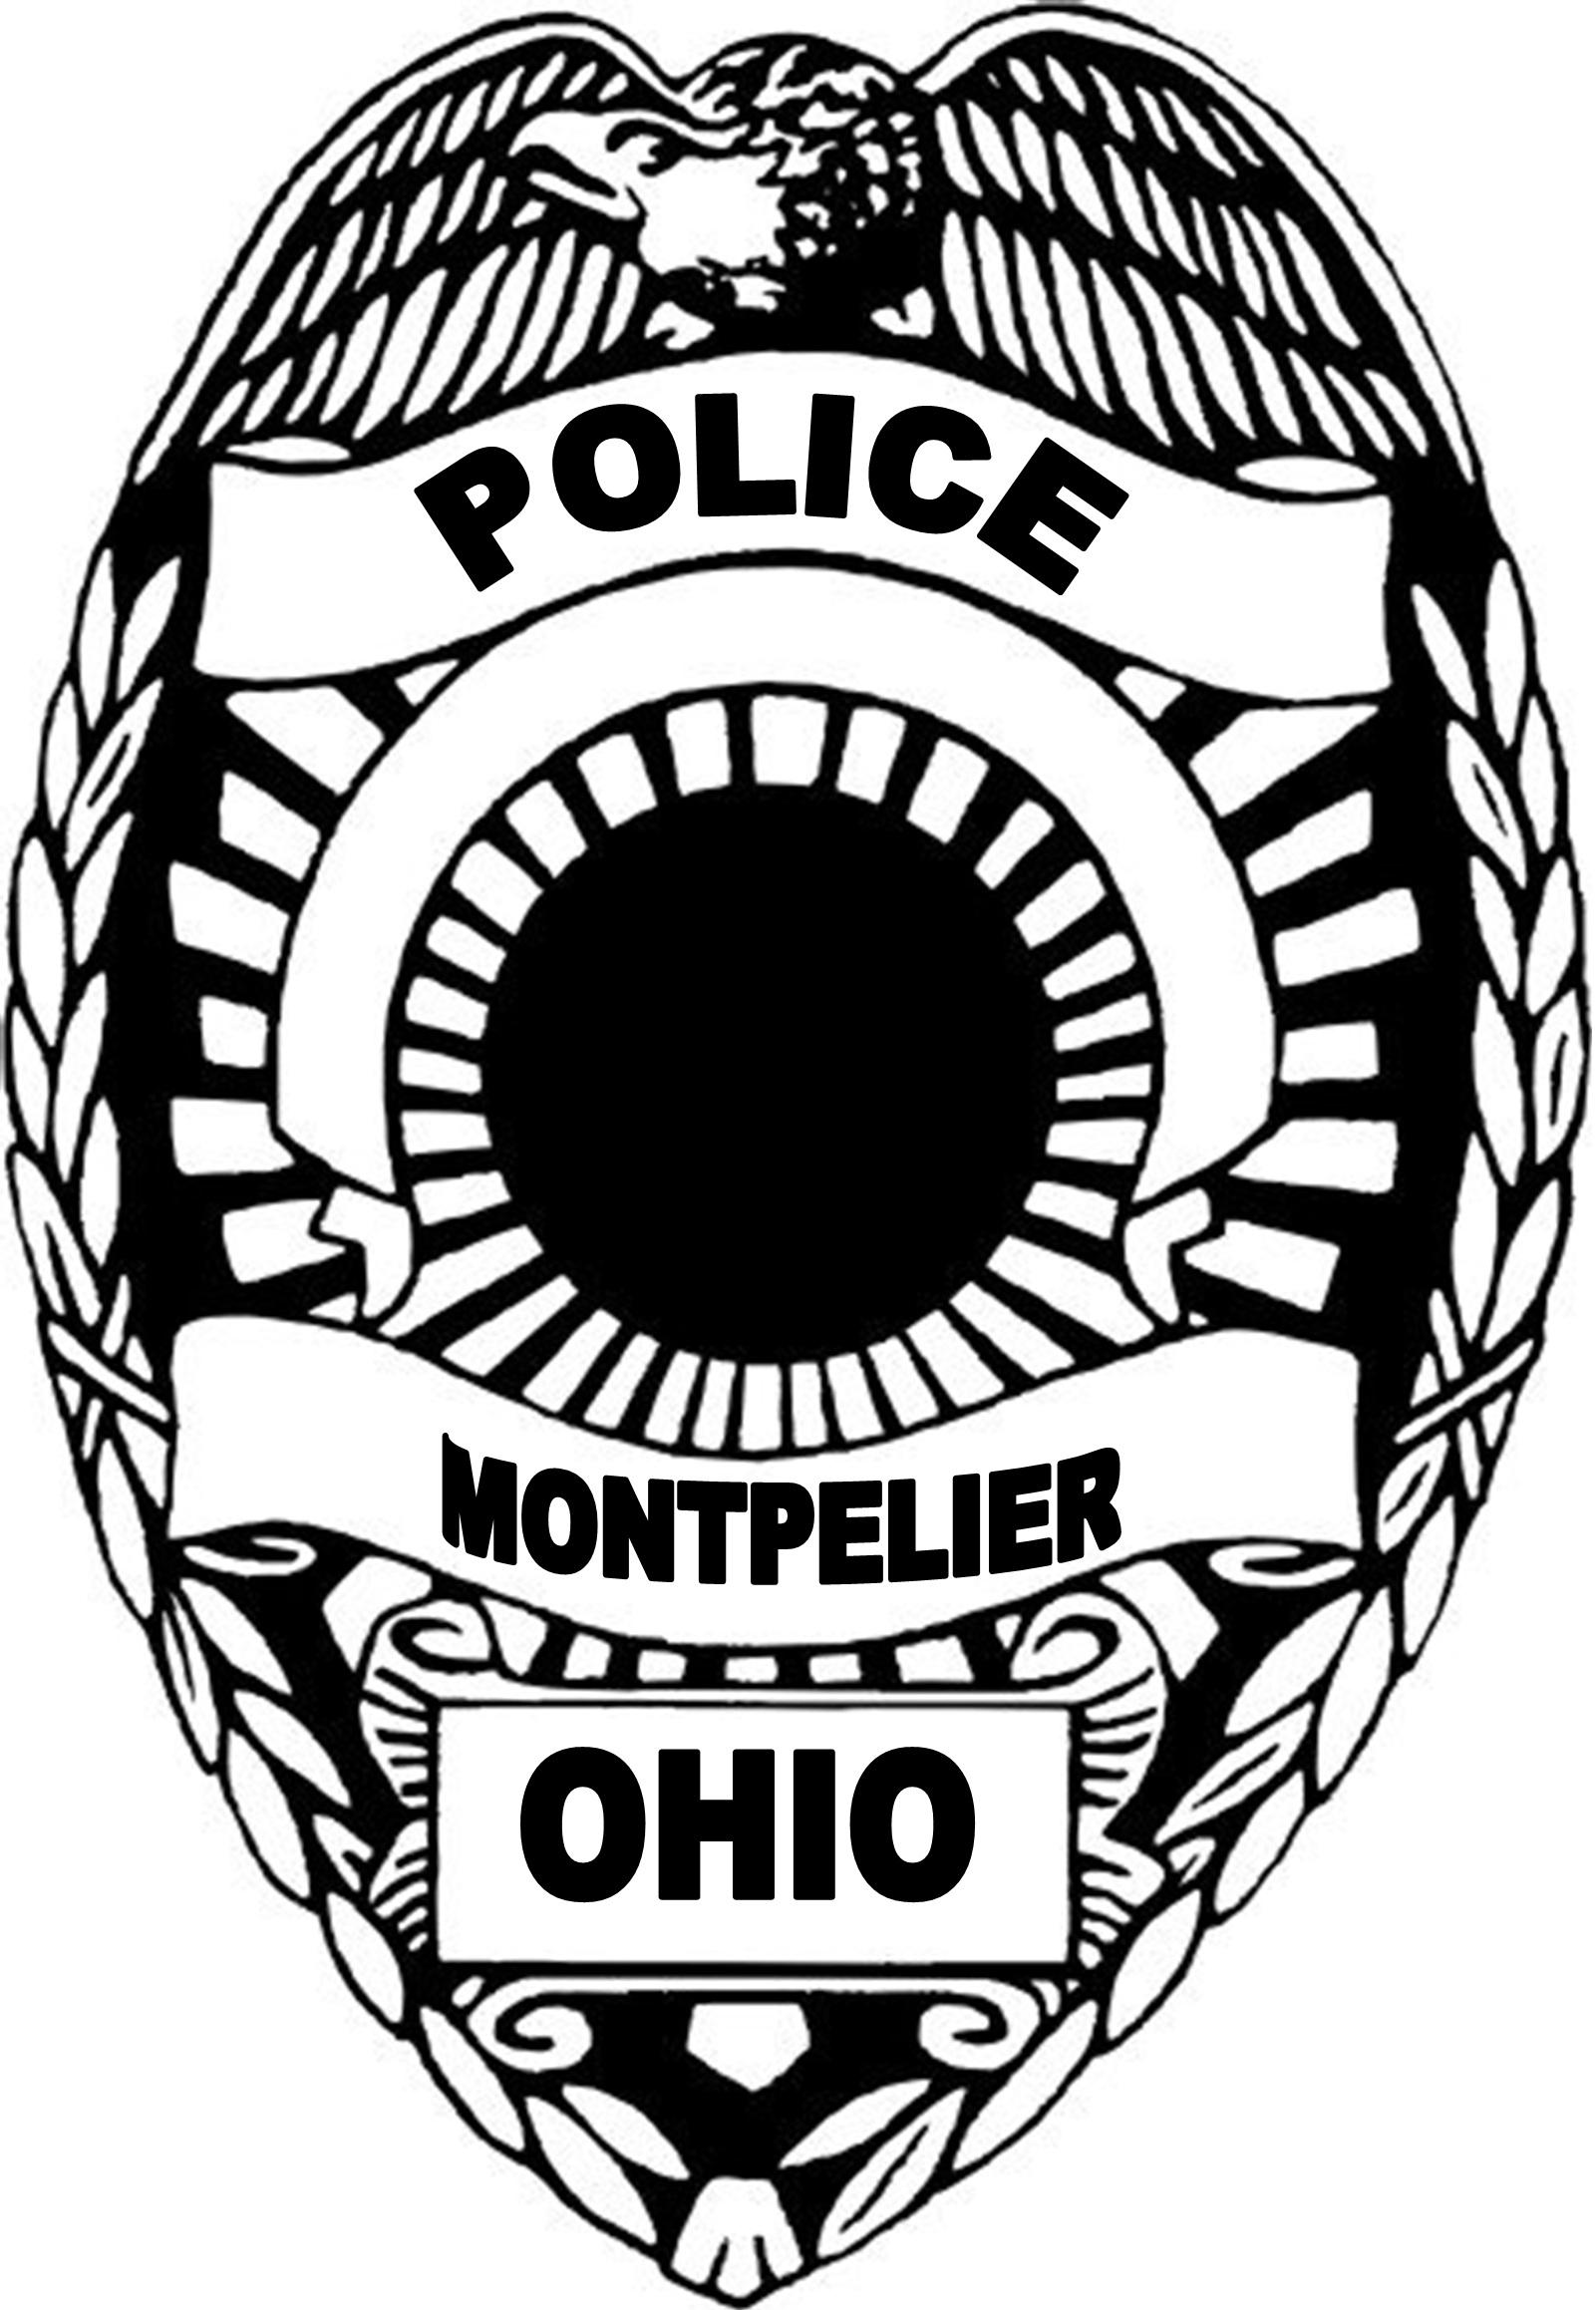 Police badge clipart vector clip art royalty free library Police badge clipart vector - ClipartFest clip art royalty free library